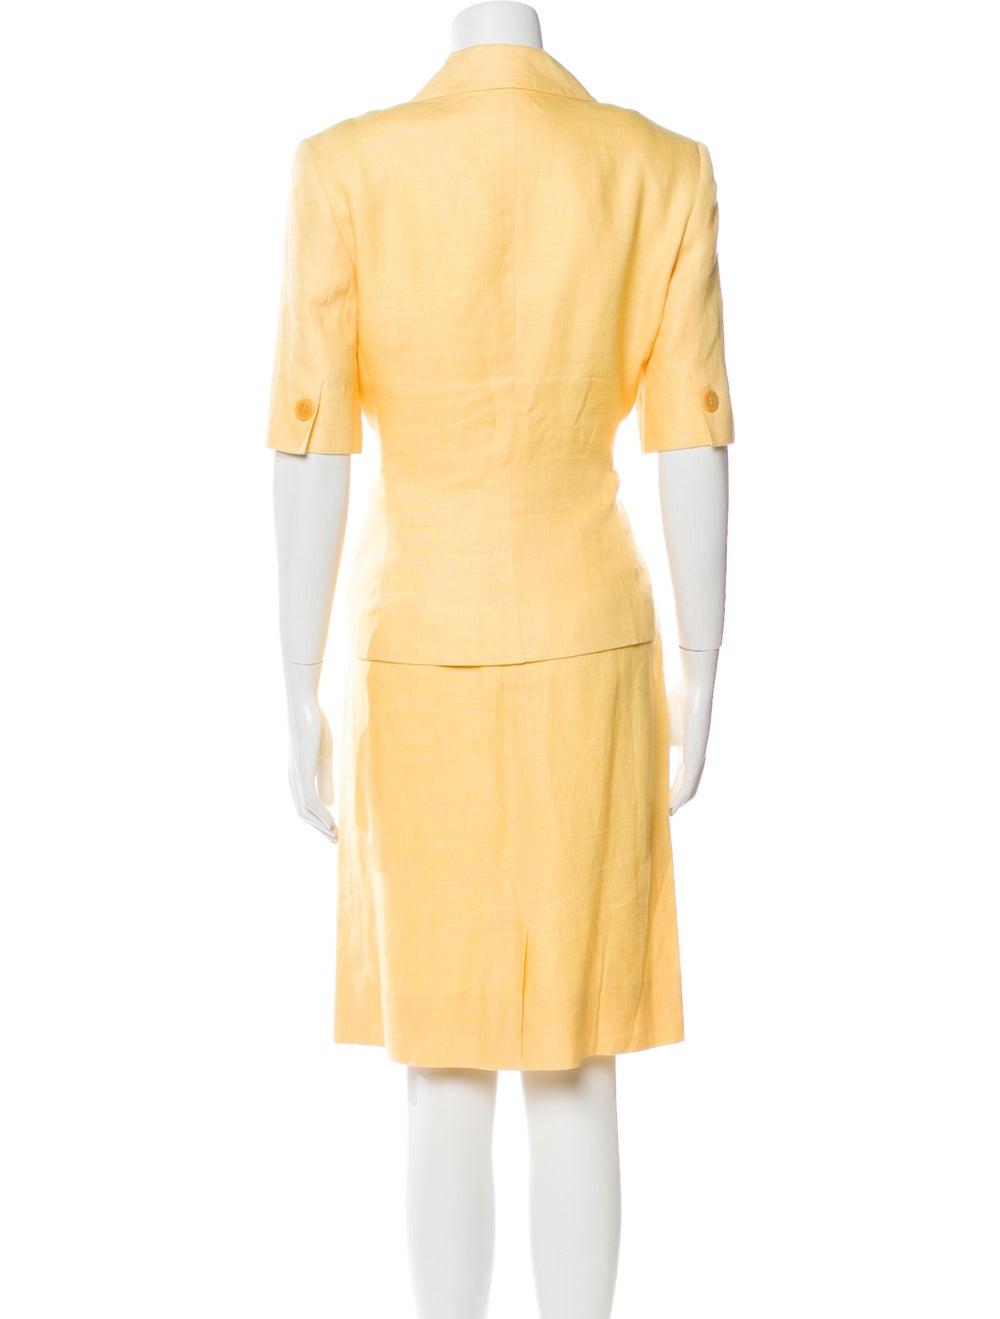 Celine Vintage Linen Skirt Suit Yellow - image 3